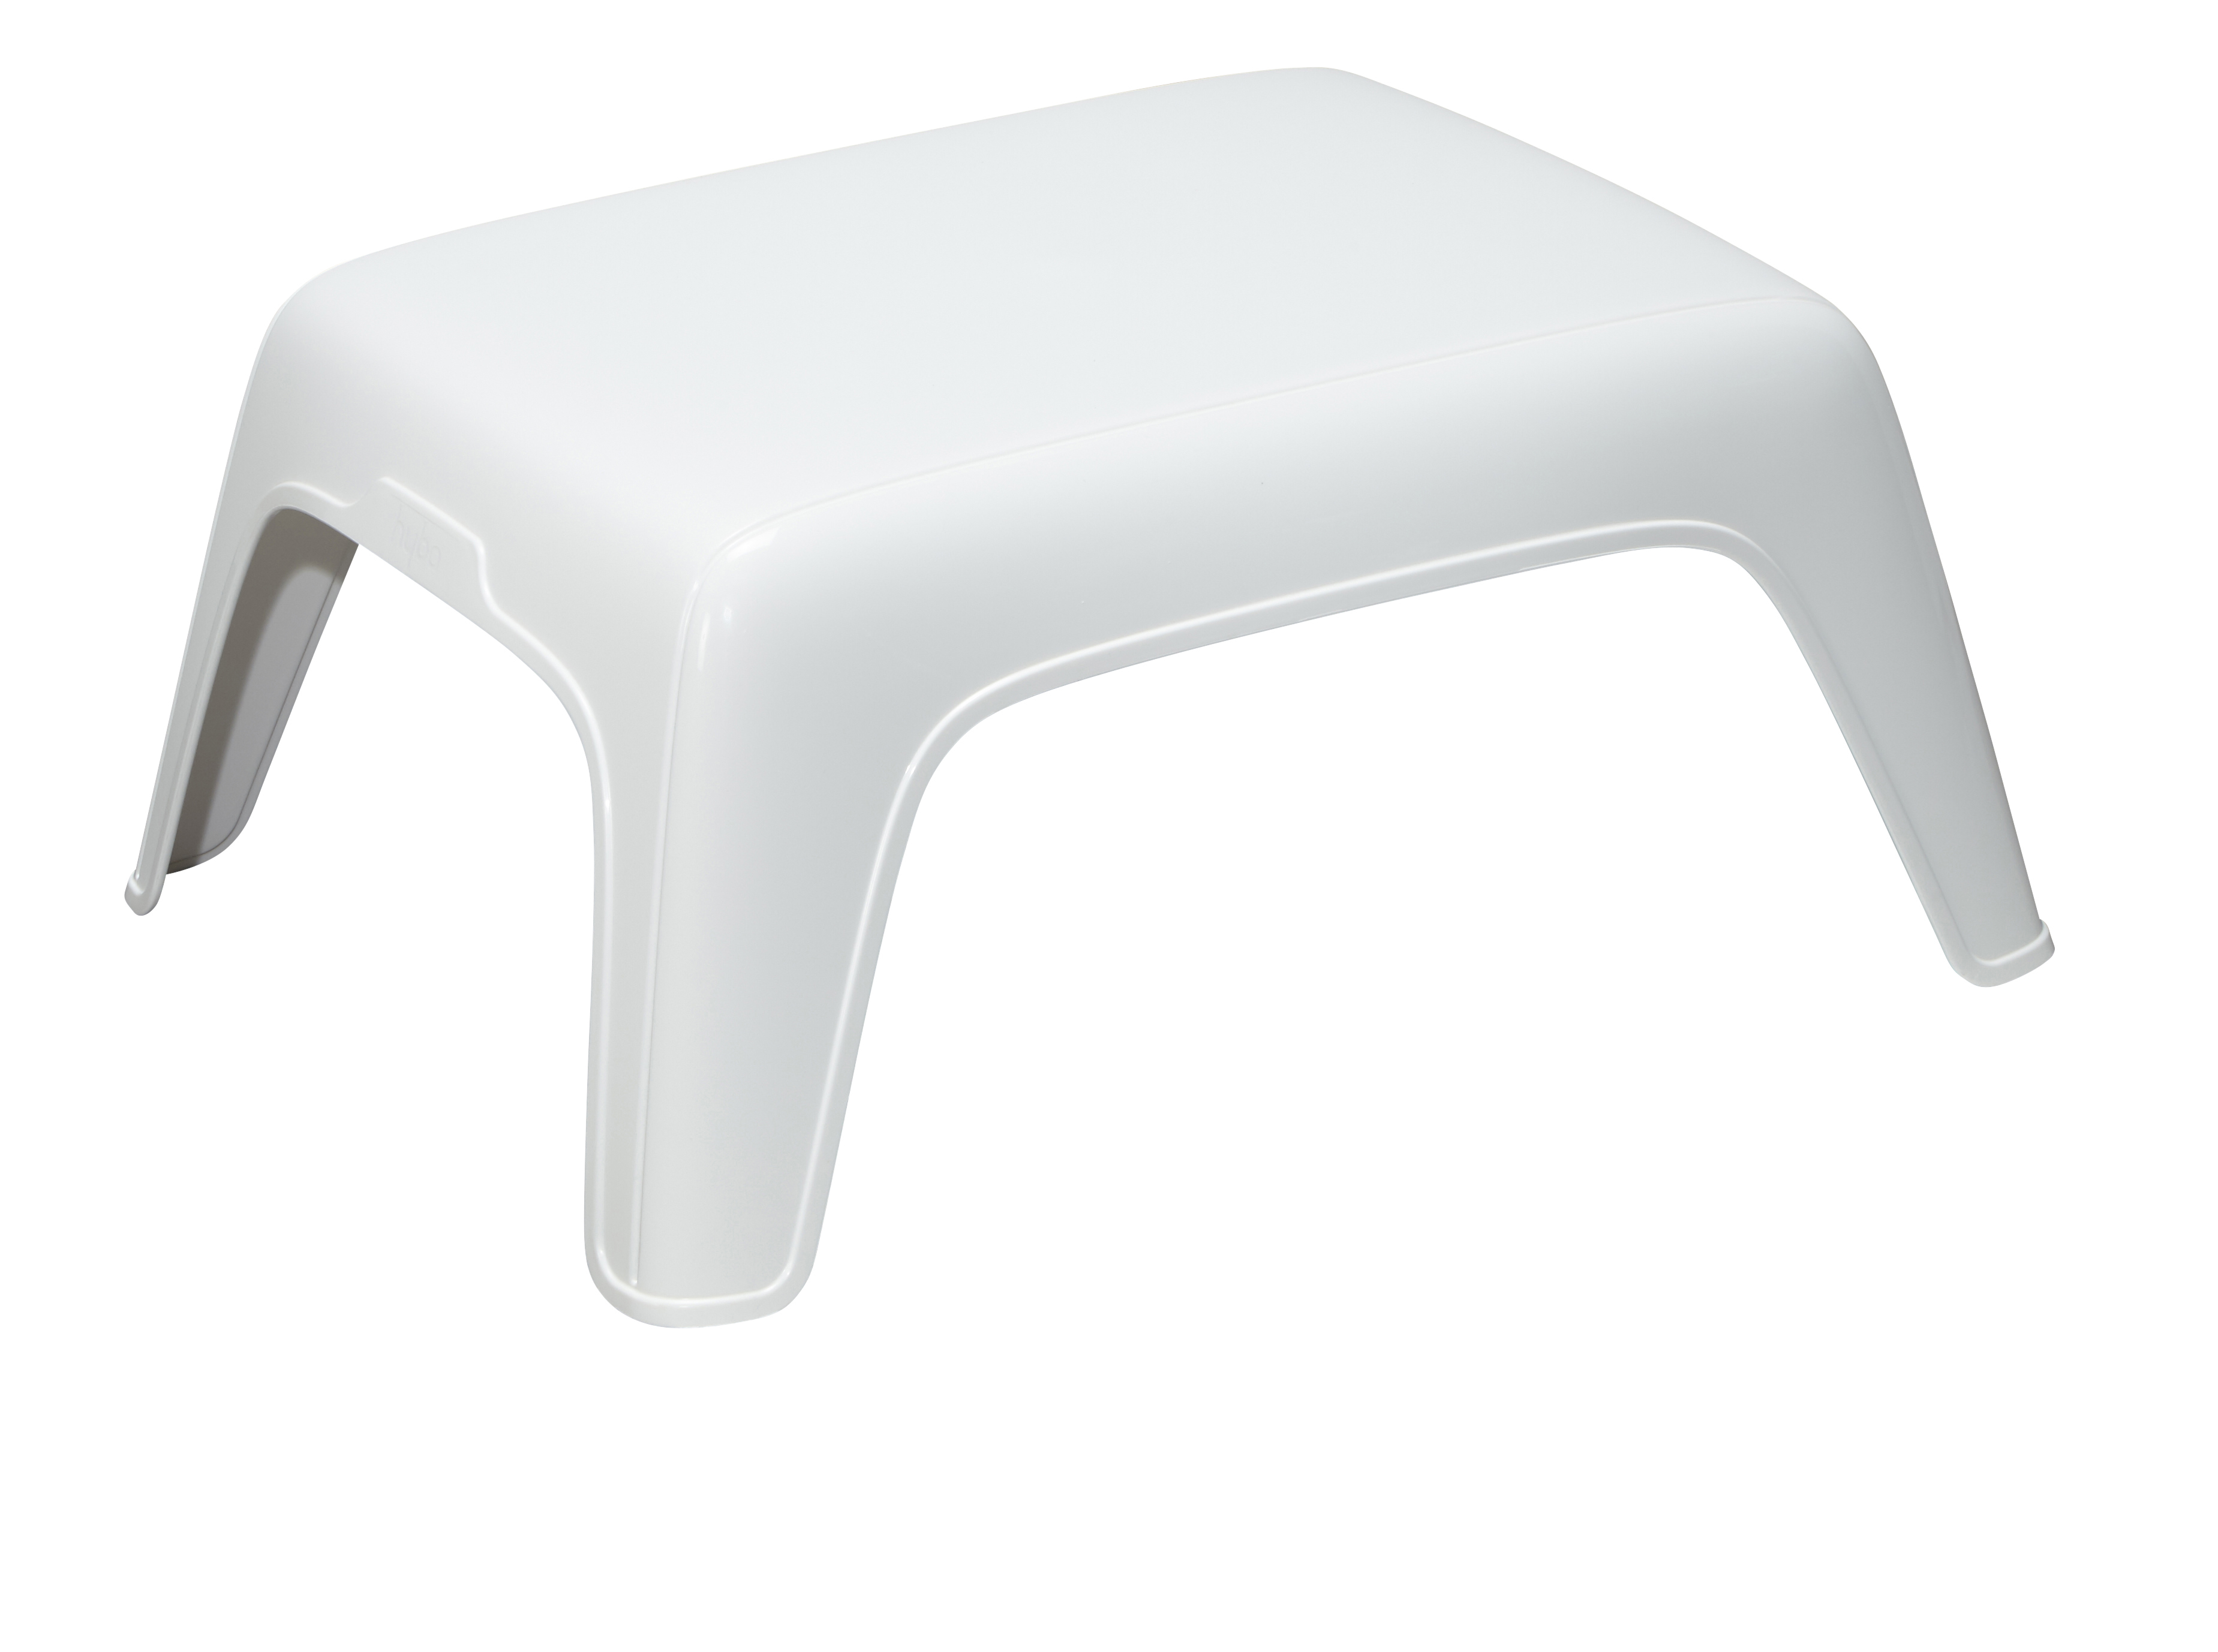 Hyba Table Basse De Jardin Blanc 73cm X 58cm X 32cm Pas Cher  # Table De Jardin Hyba